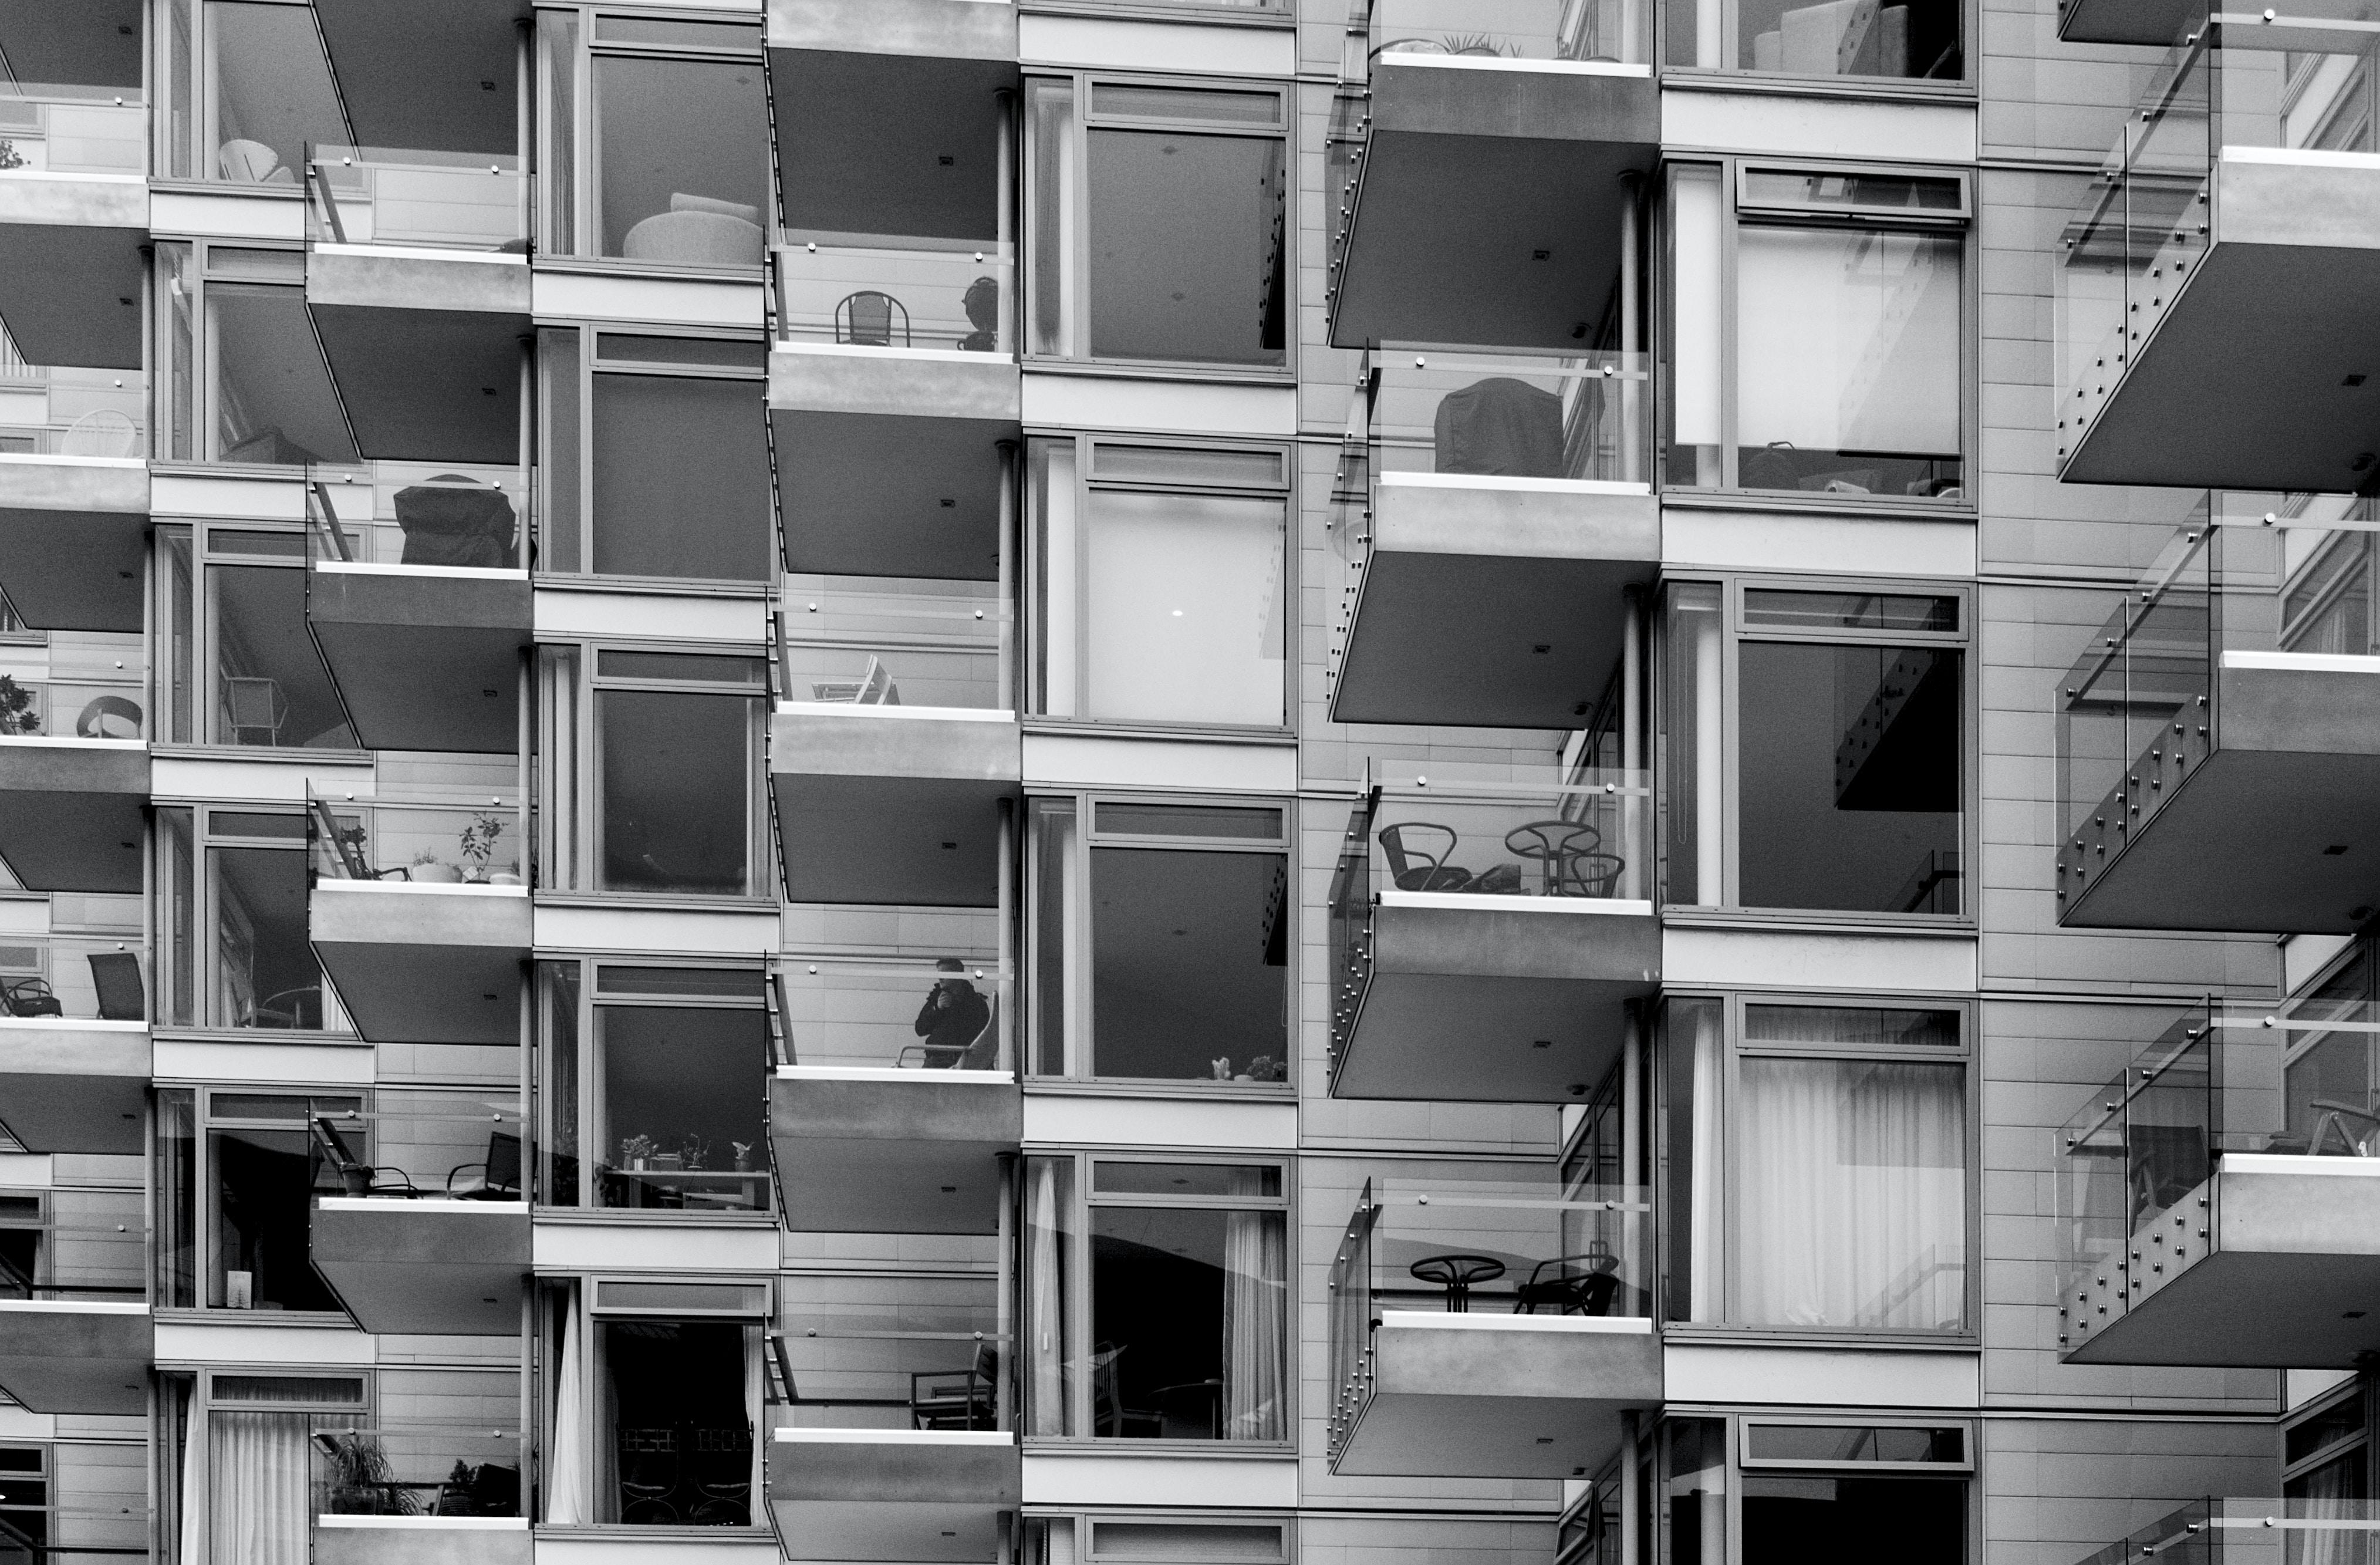 photo of building balcony